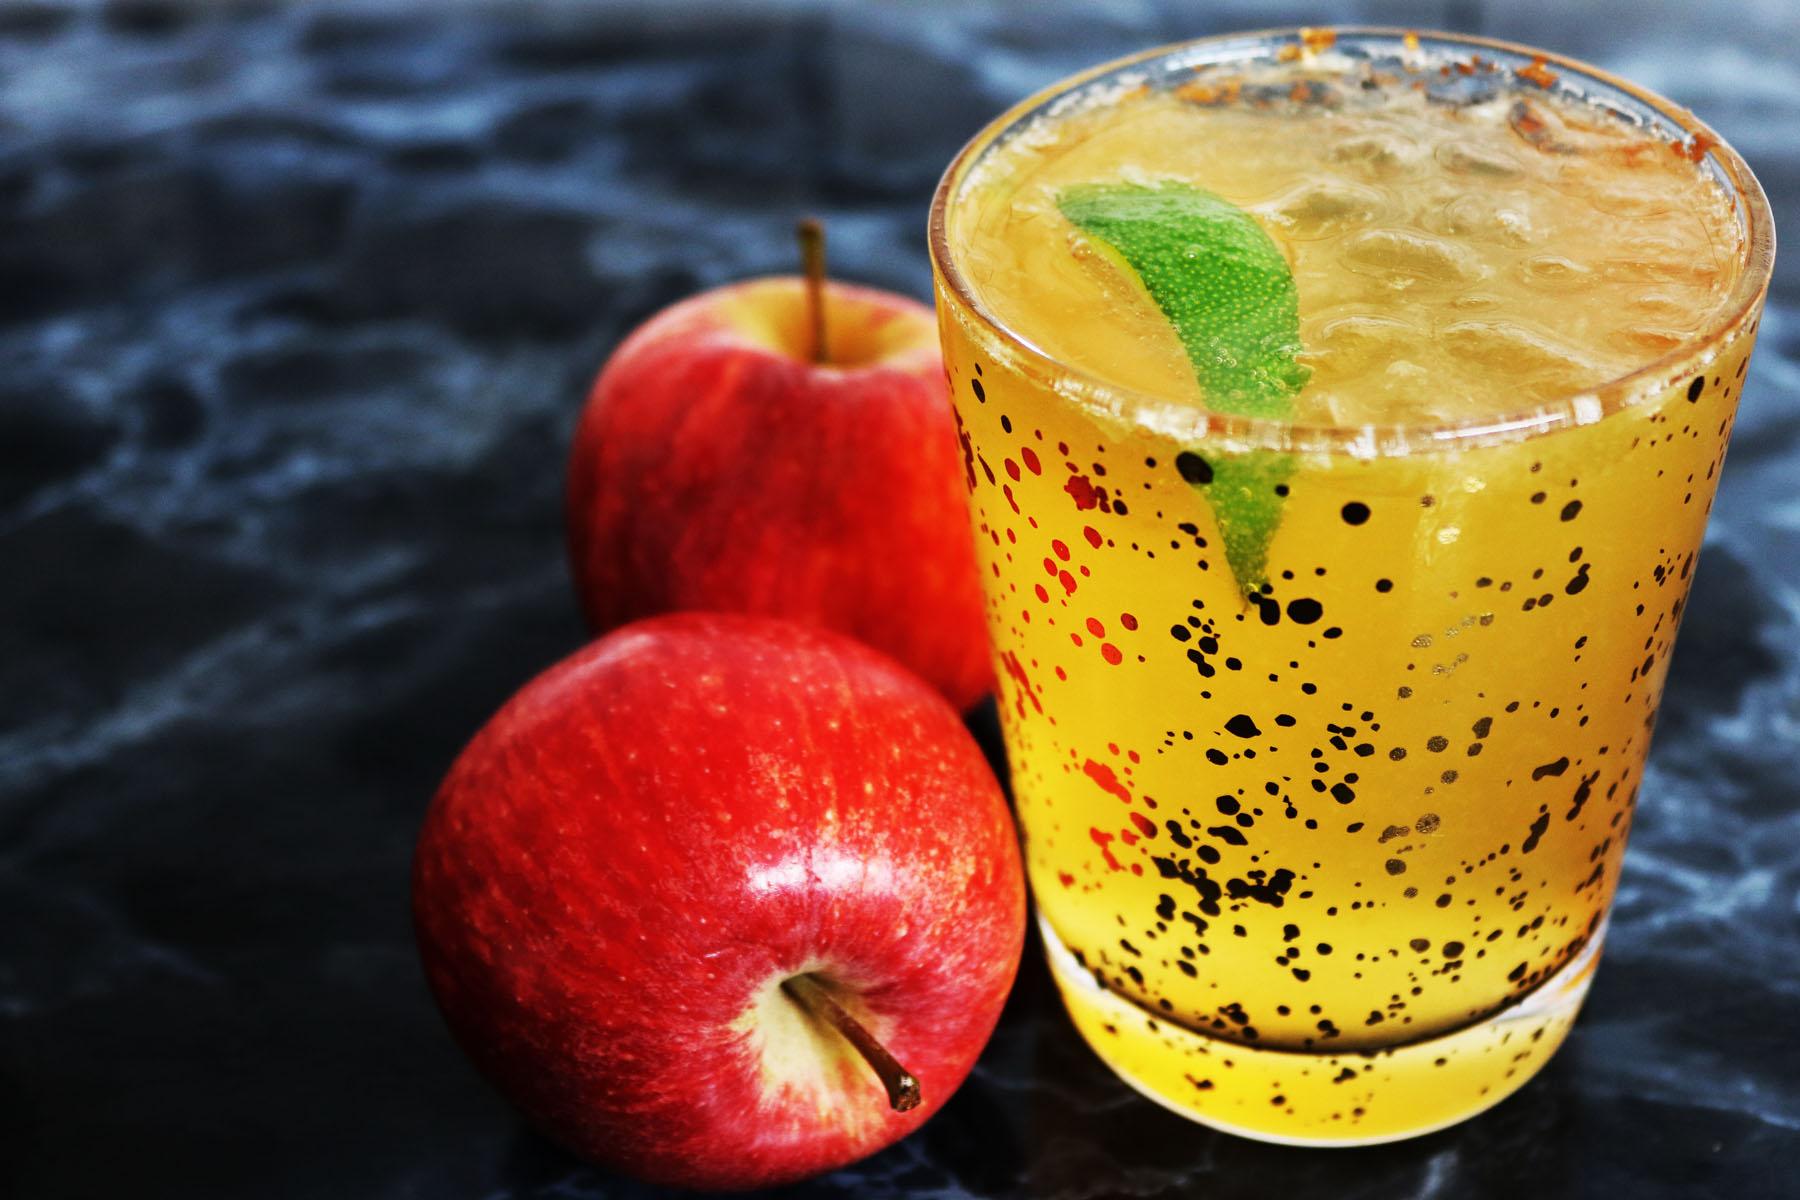 Cornish Shipwreck Cider Cocktail